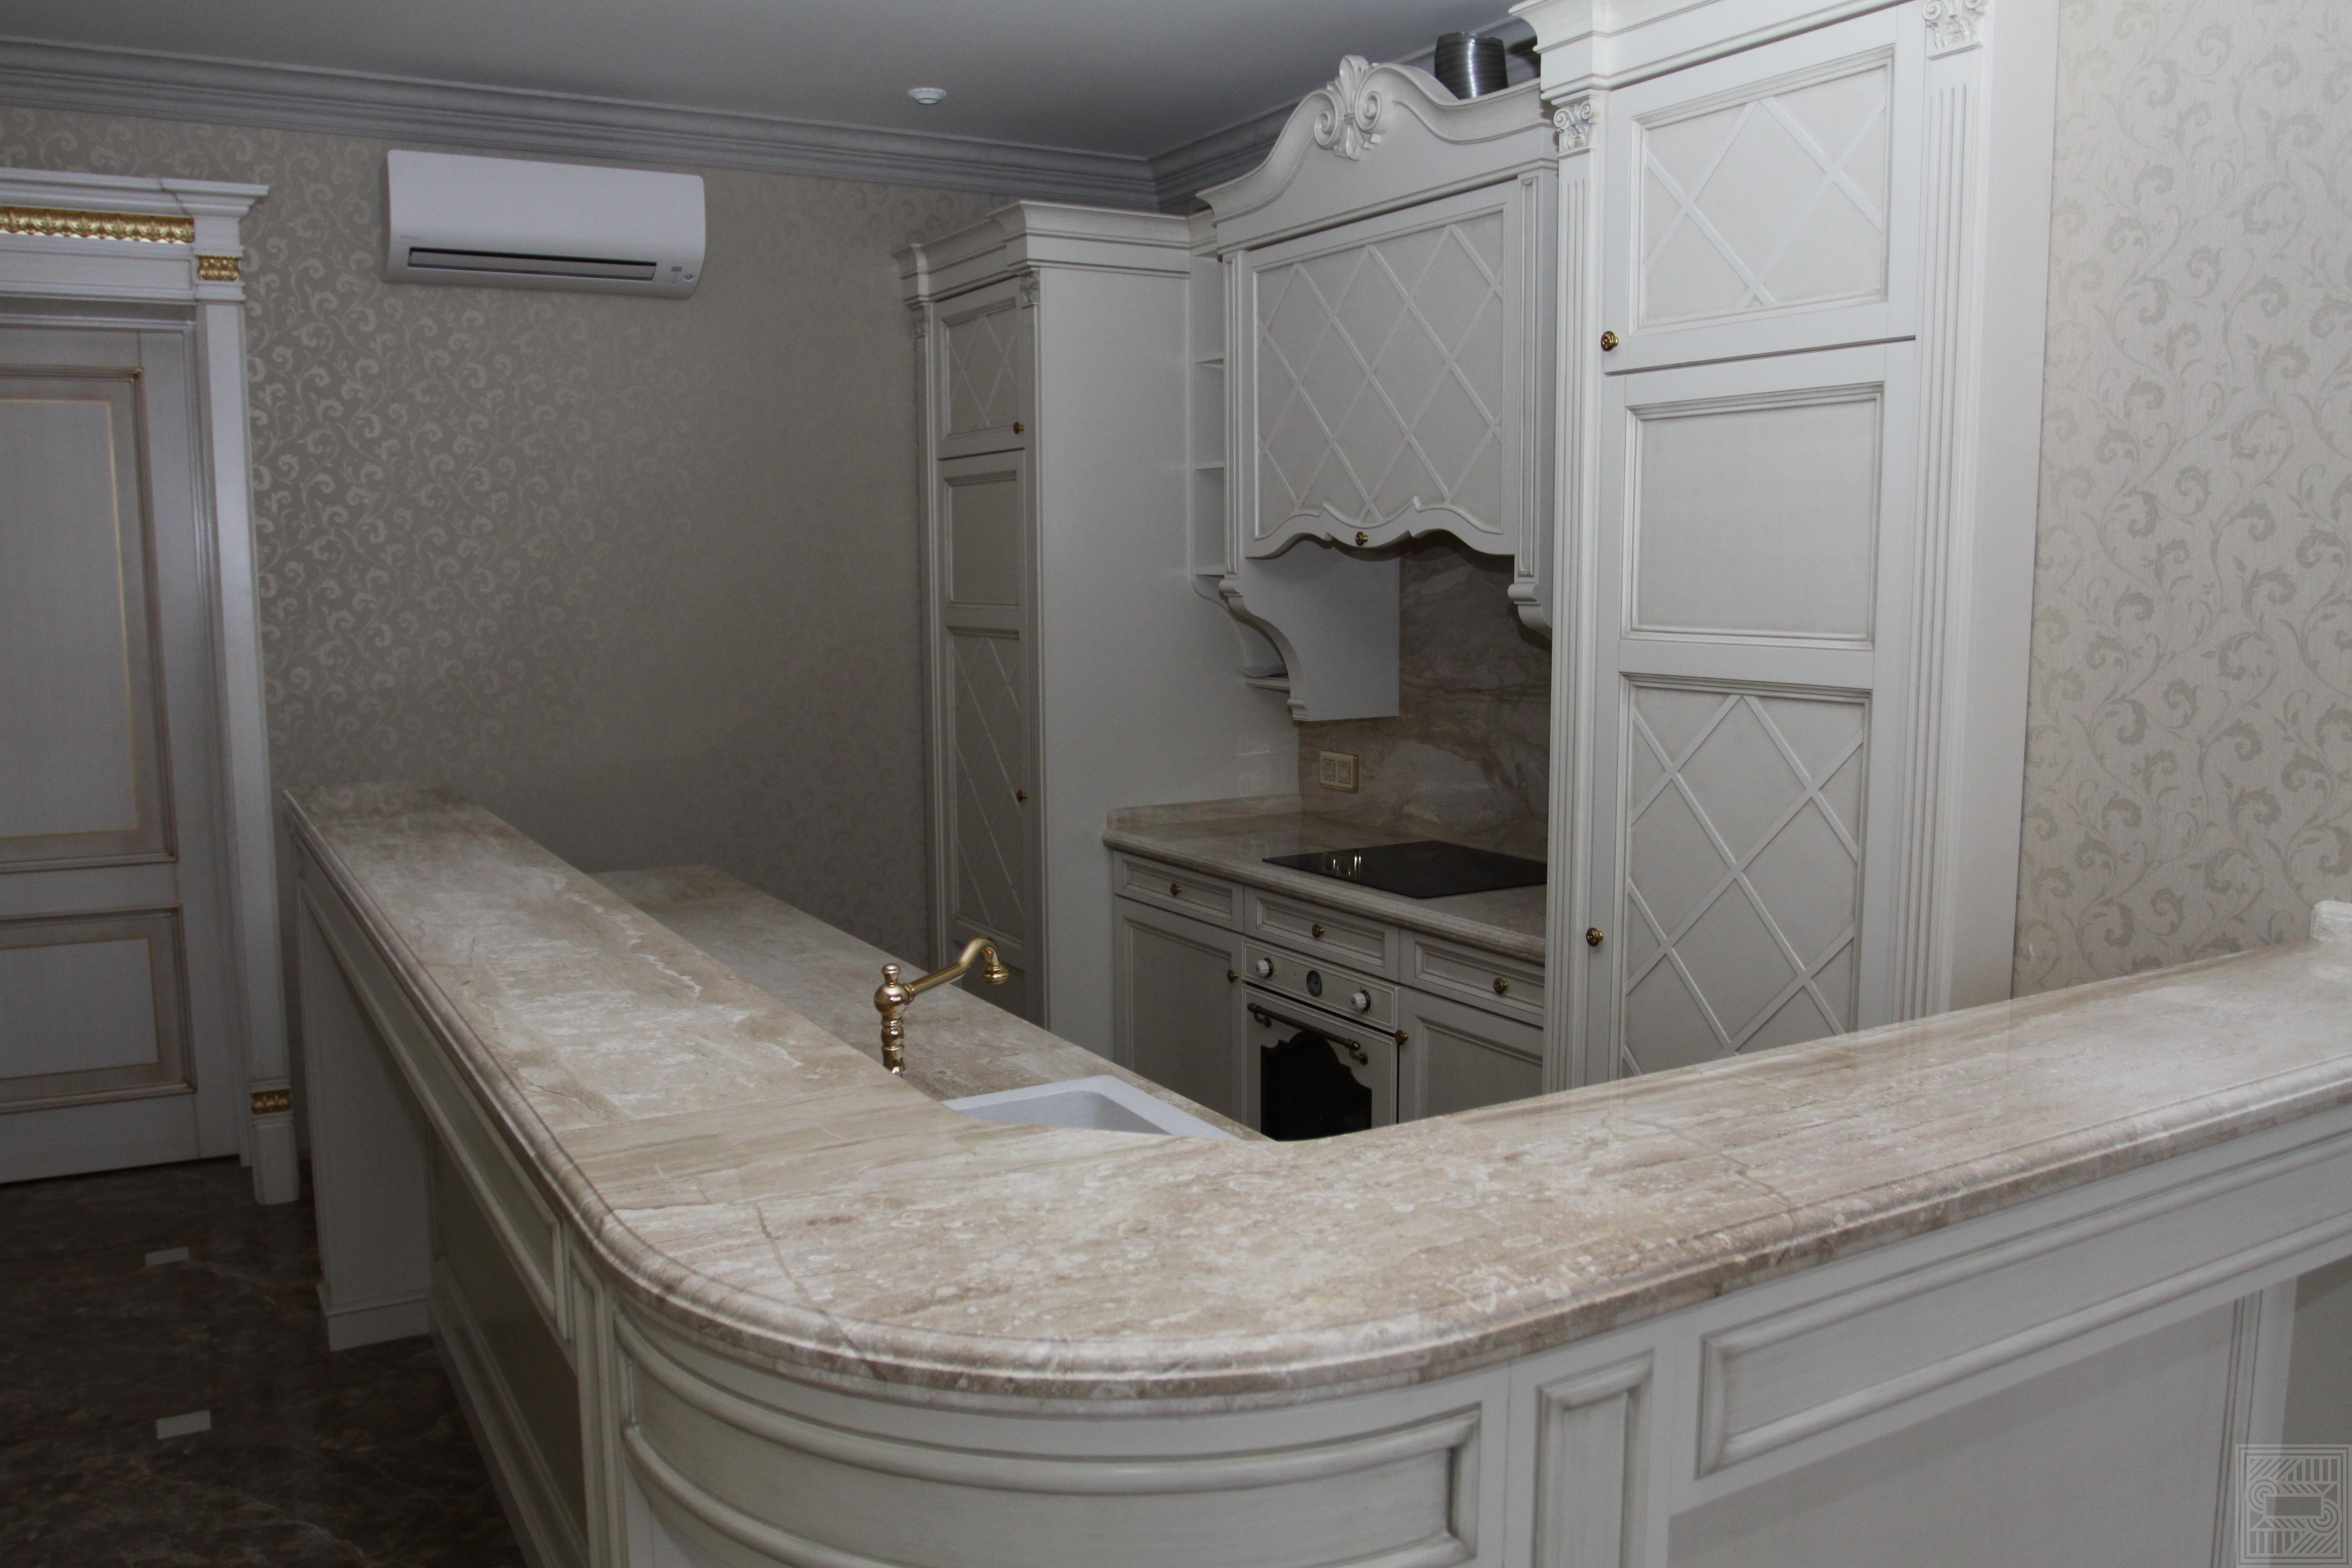 Кухонная рабочая поверхность из мрамора Daino 30 мм worktop-marble, furniture - Kuhonnaya rabochaya poverhnost iz mramora Daino 30 mm 3